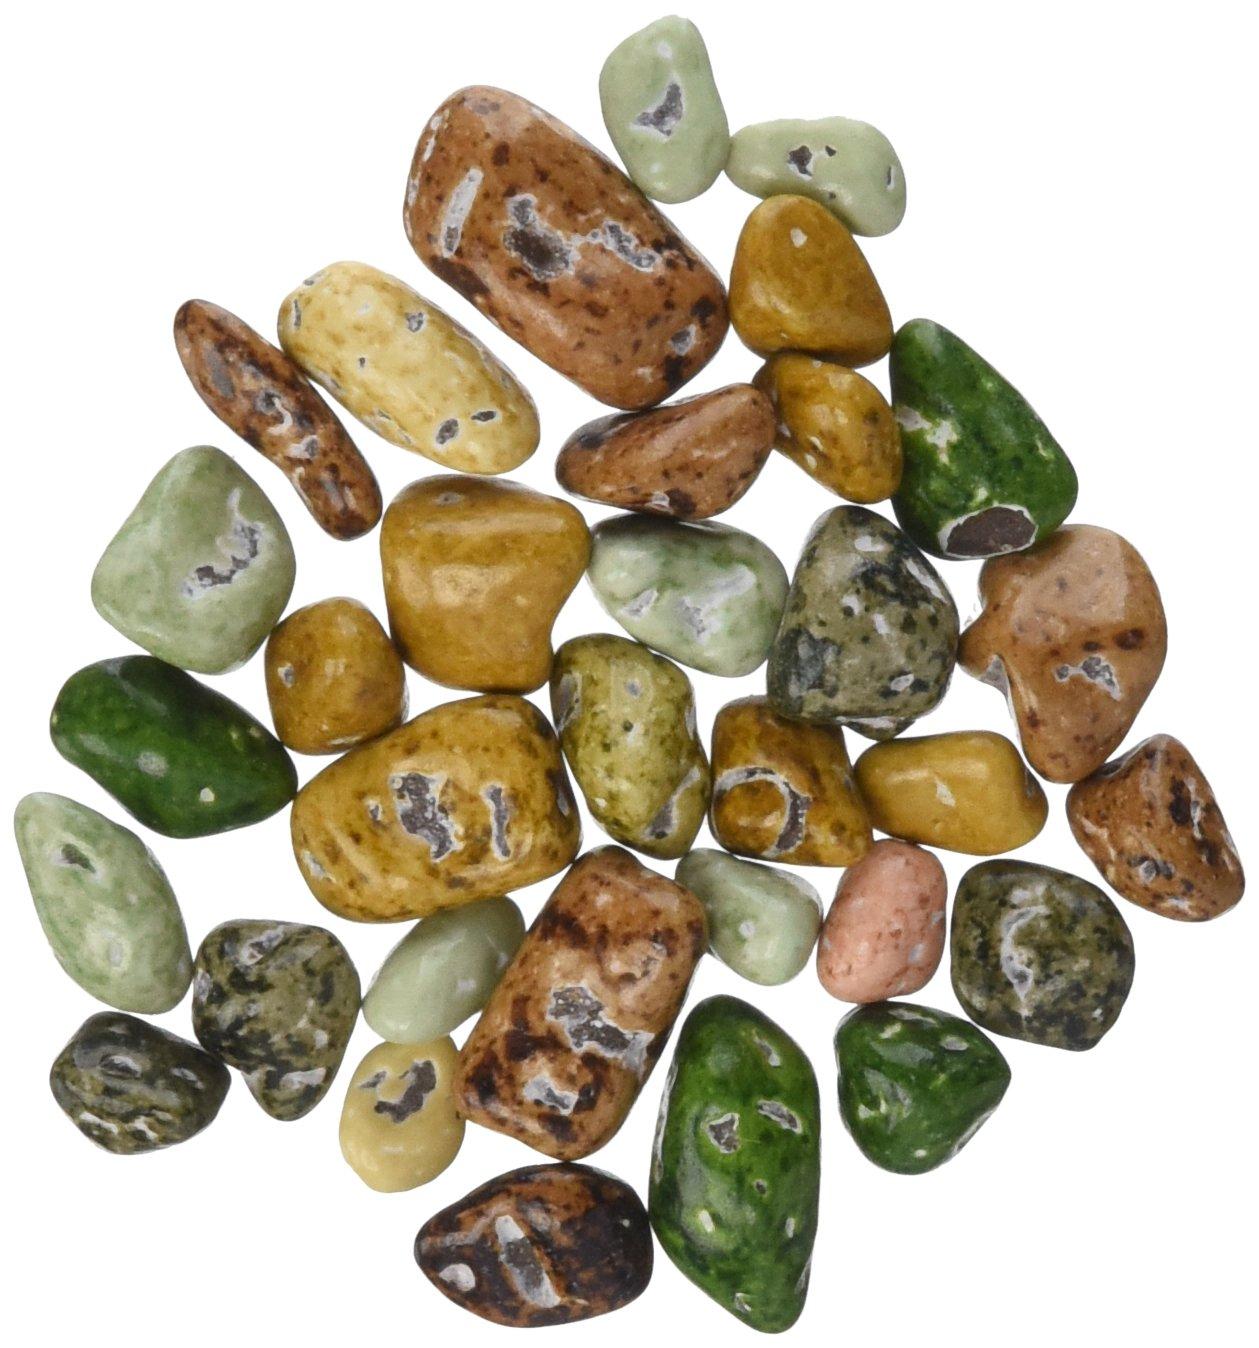 Amazon.com : Chocolate River Stones (1lb Bag) : Chocolate ...